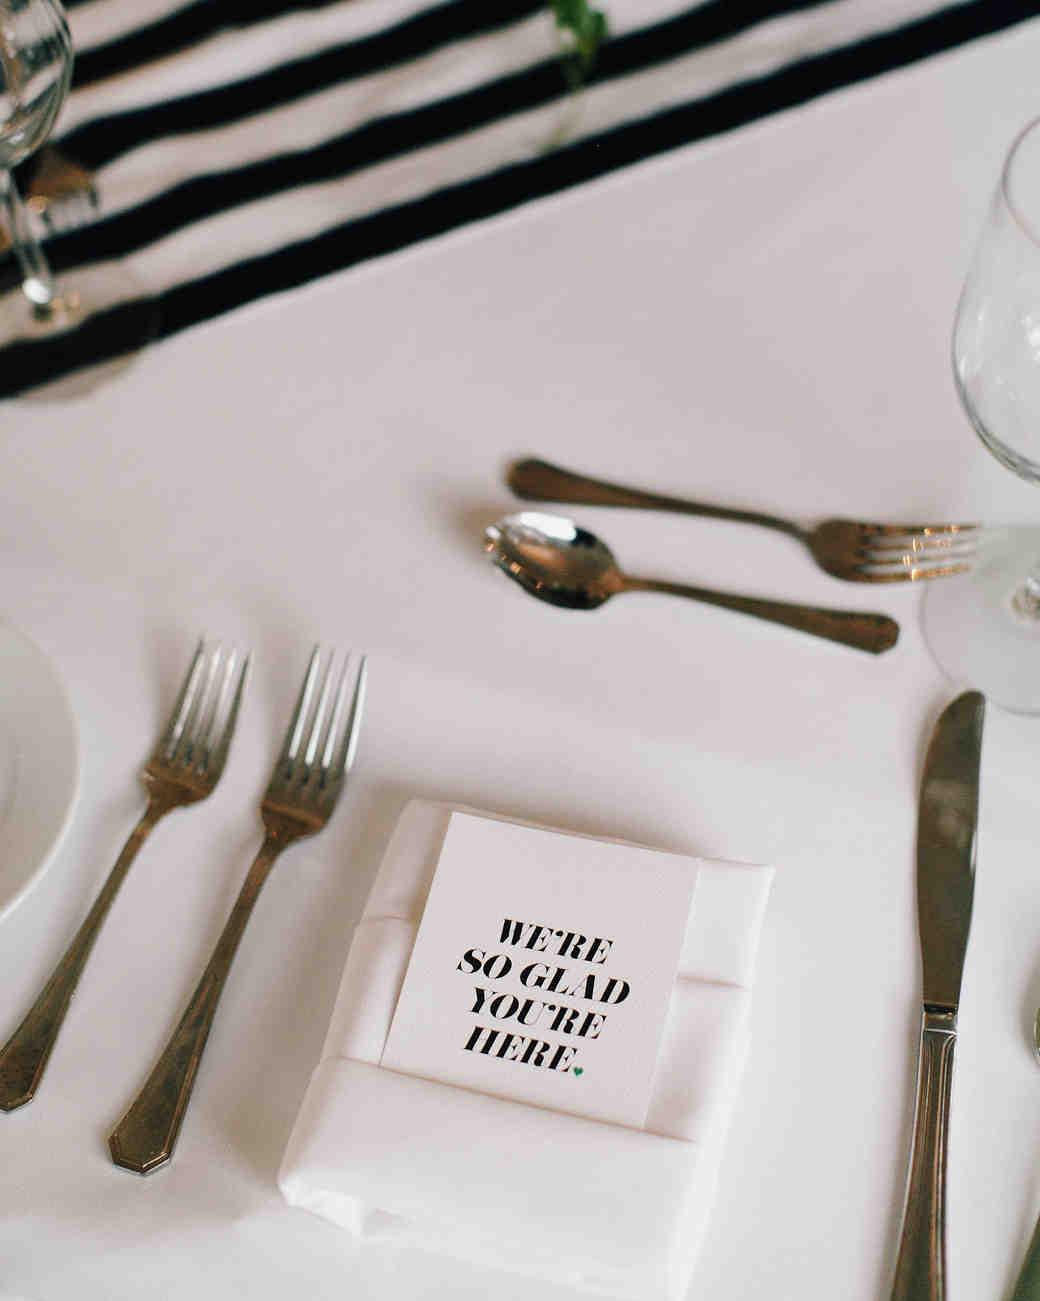 rosie-constantine-wedding-placesetting-276-s112177-1015.jpg